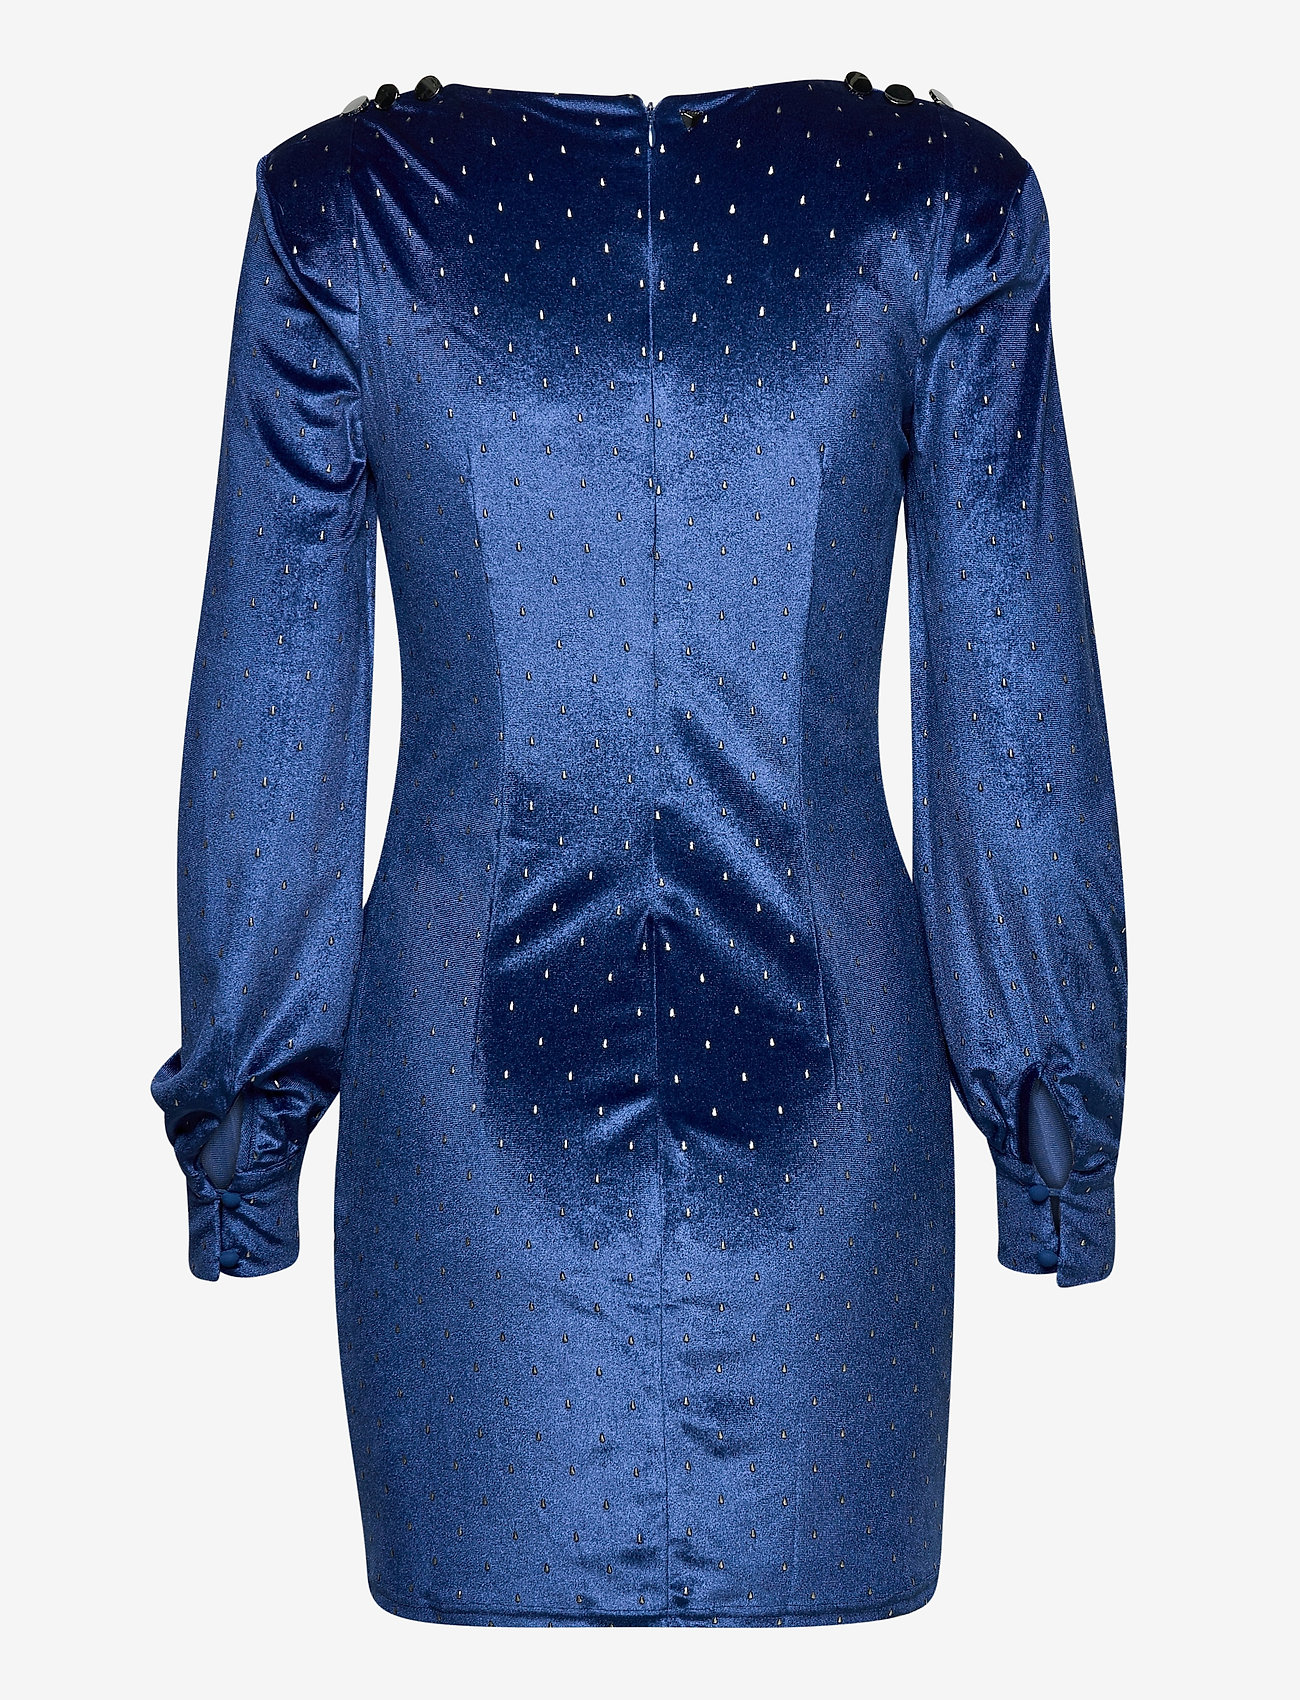 GUESS Jeans - RANIA DRESS - fodralklänningar - sharp navy - 1